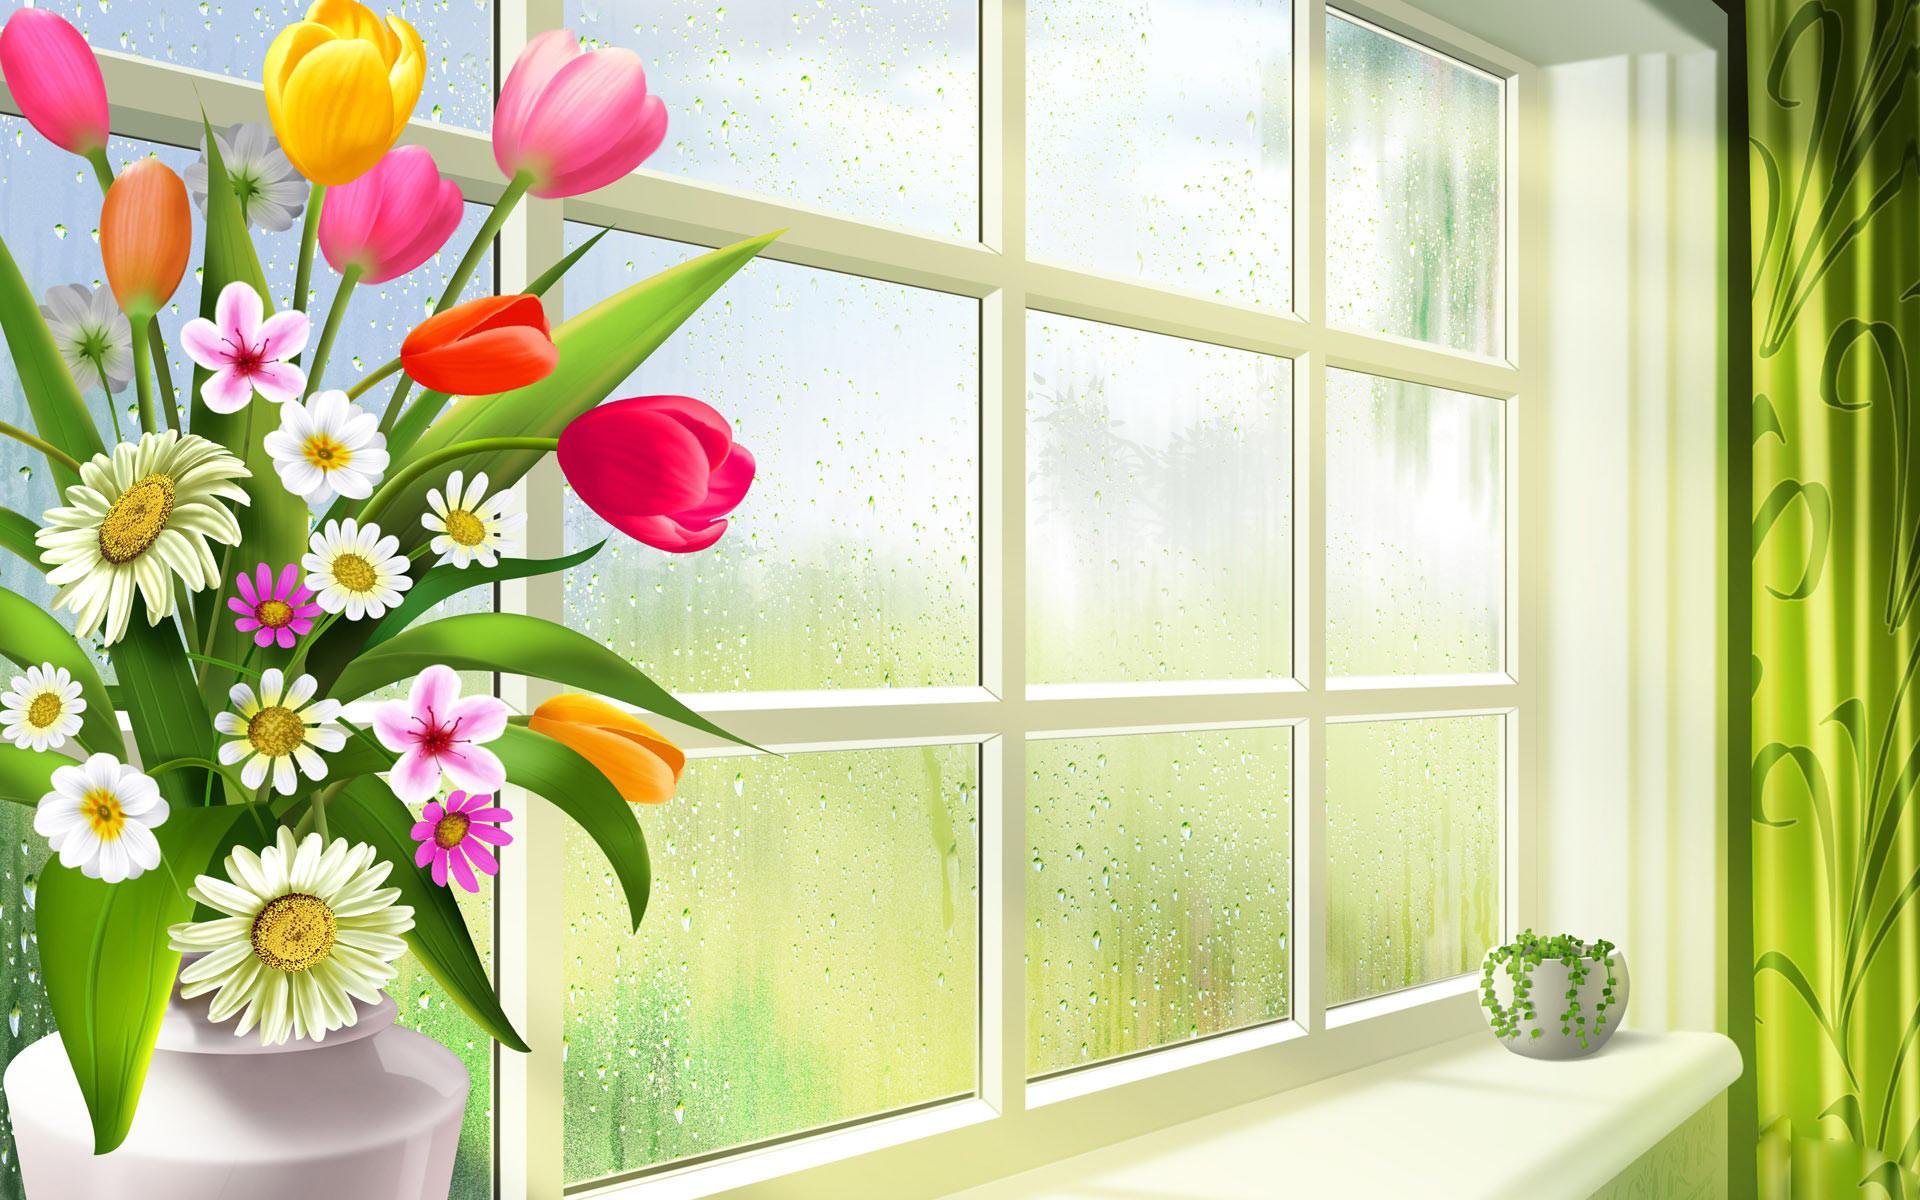 Desktop Backgrounds, wallpaper, Pretty Spring Desktop Backgrounds hd .